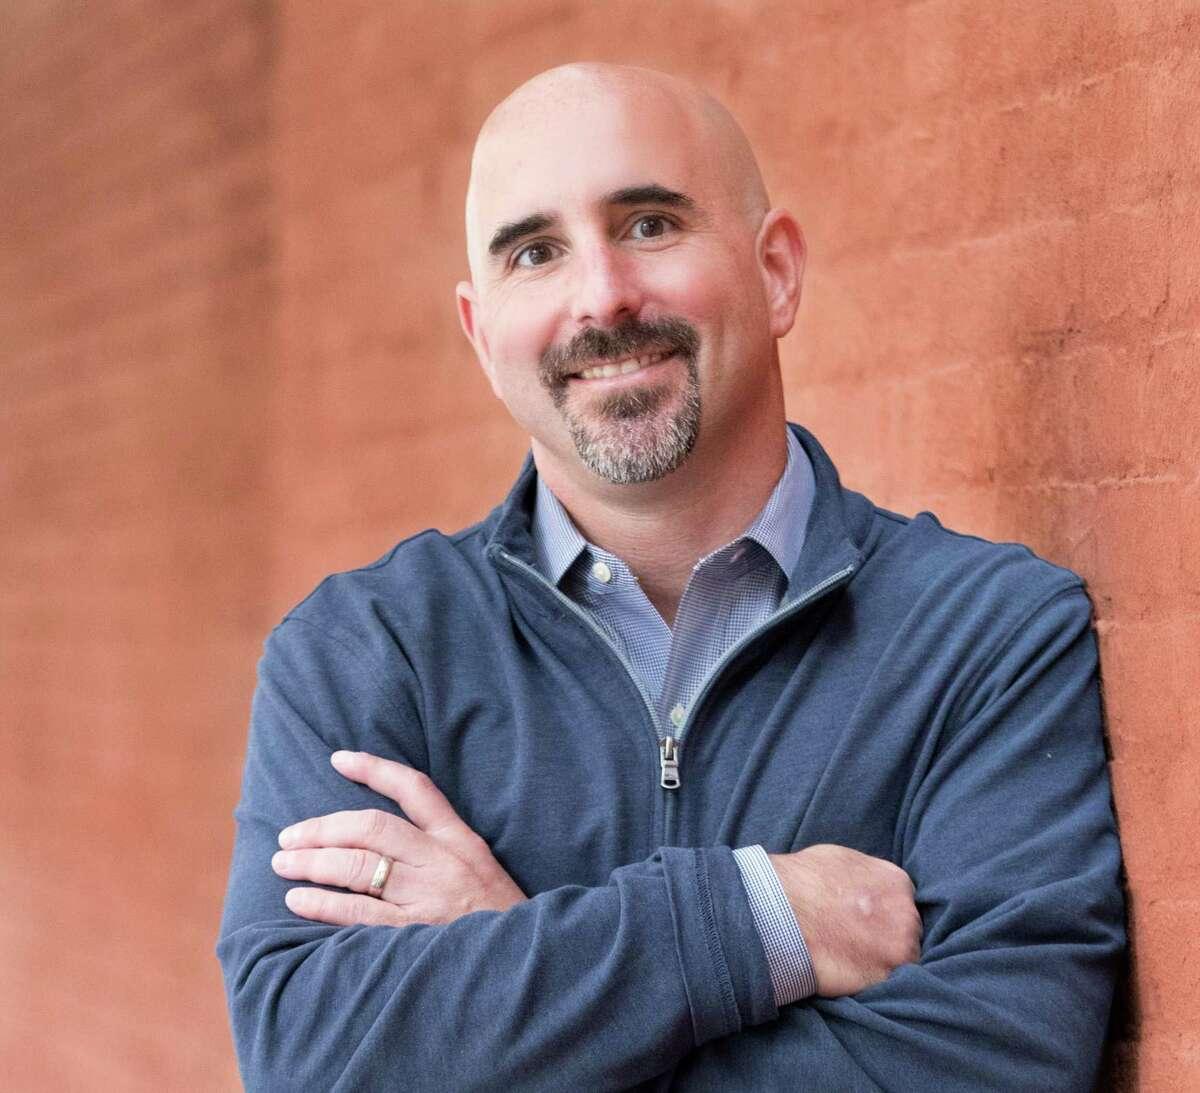 Dan Kittredge is managing partner at Ten Coves Capital